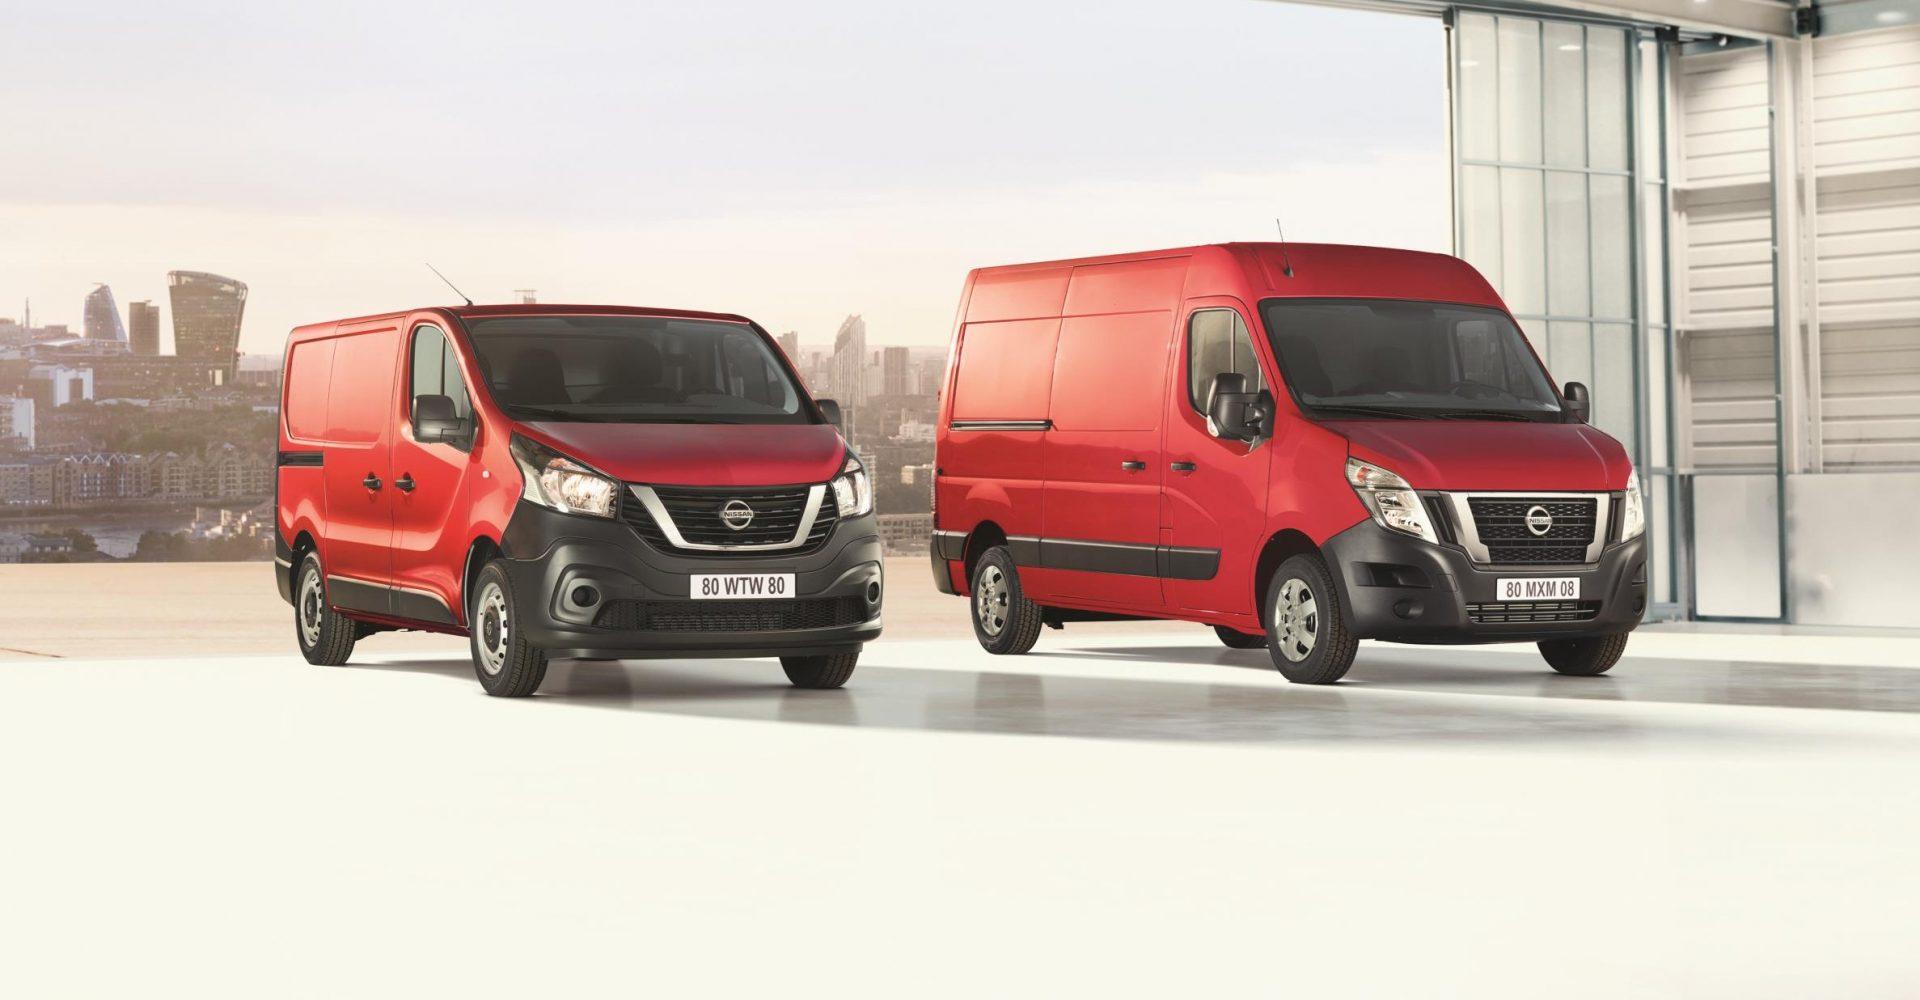 Nissan upgrades NV300 and NV400 vans